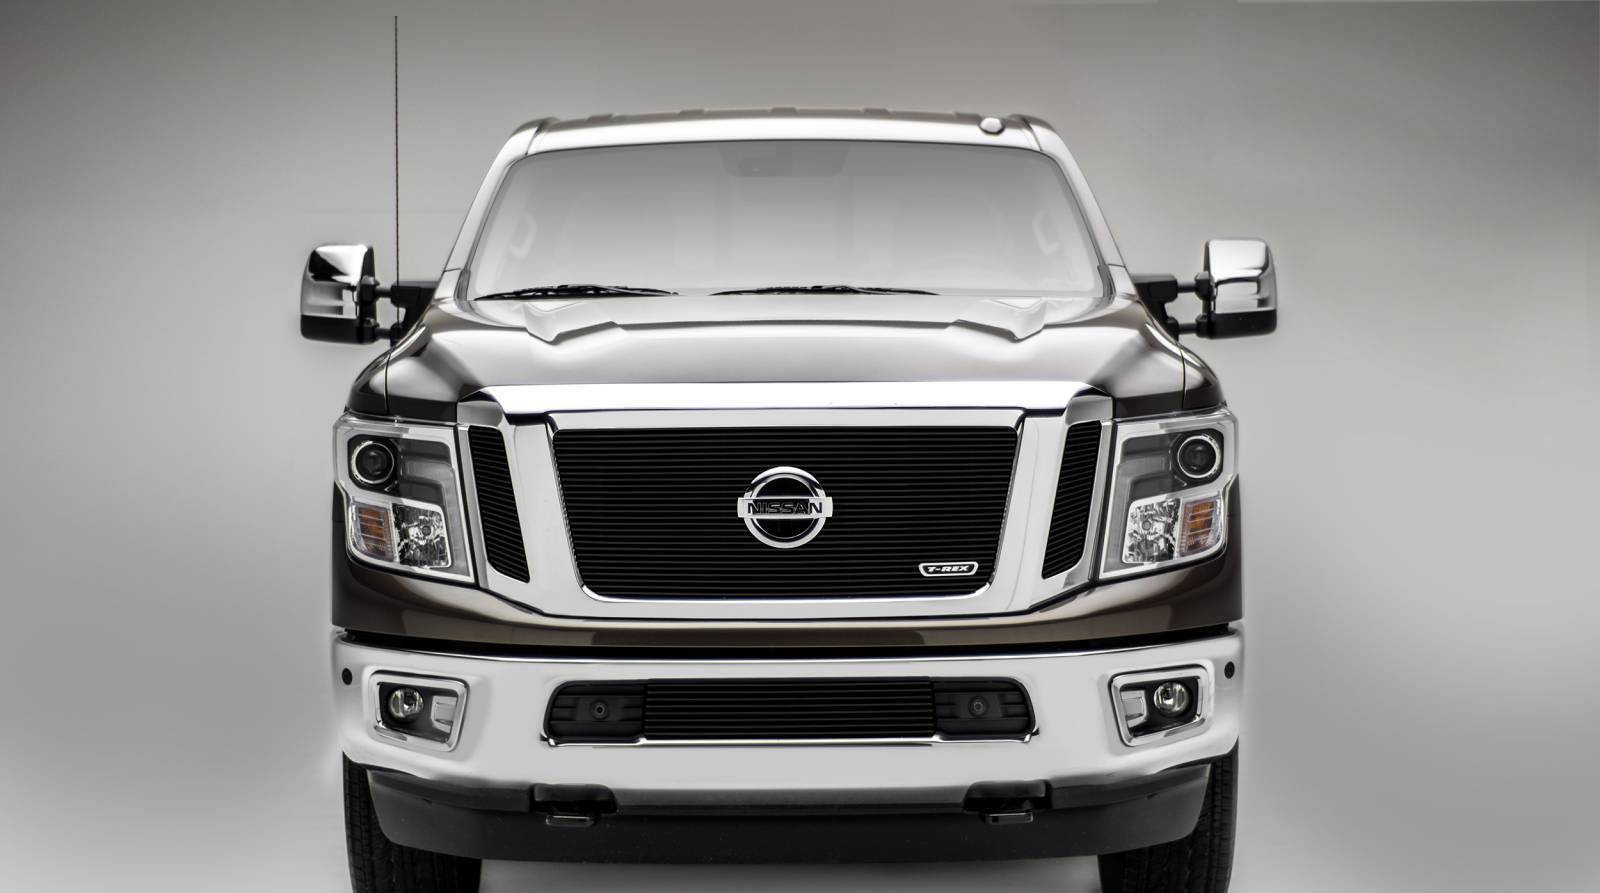 2016-2019 Titan Billet Grille, Black, 3 Pc, Insert, Fits Vehicles with Camera - PN #20785B